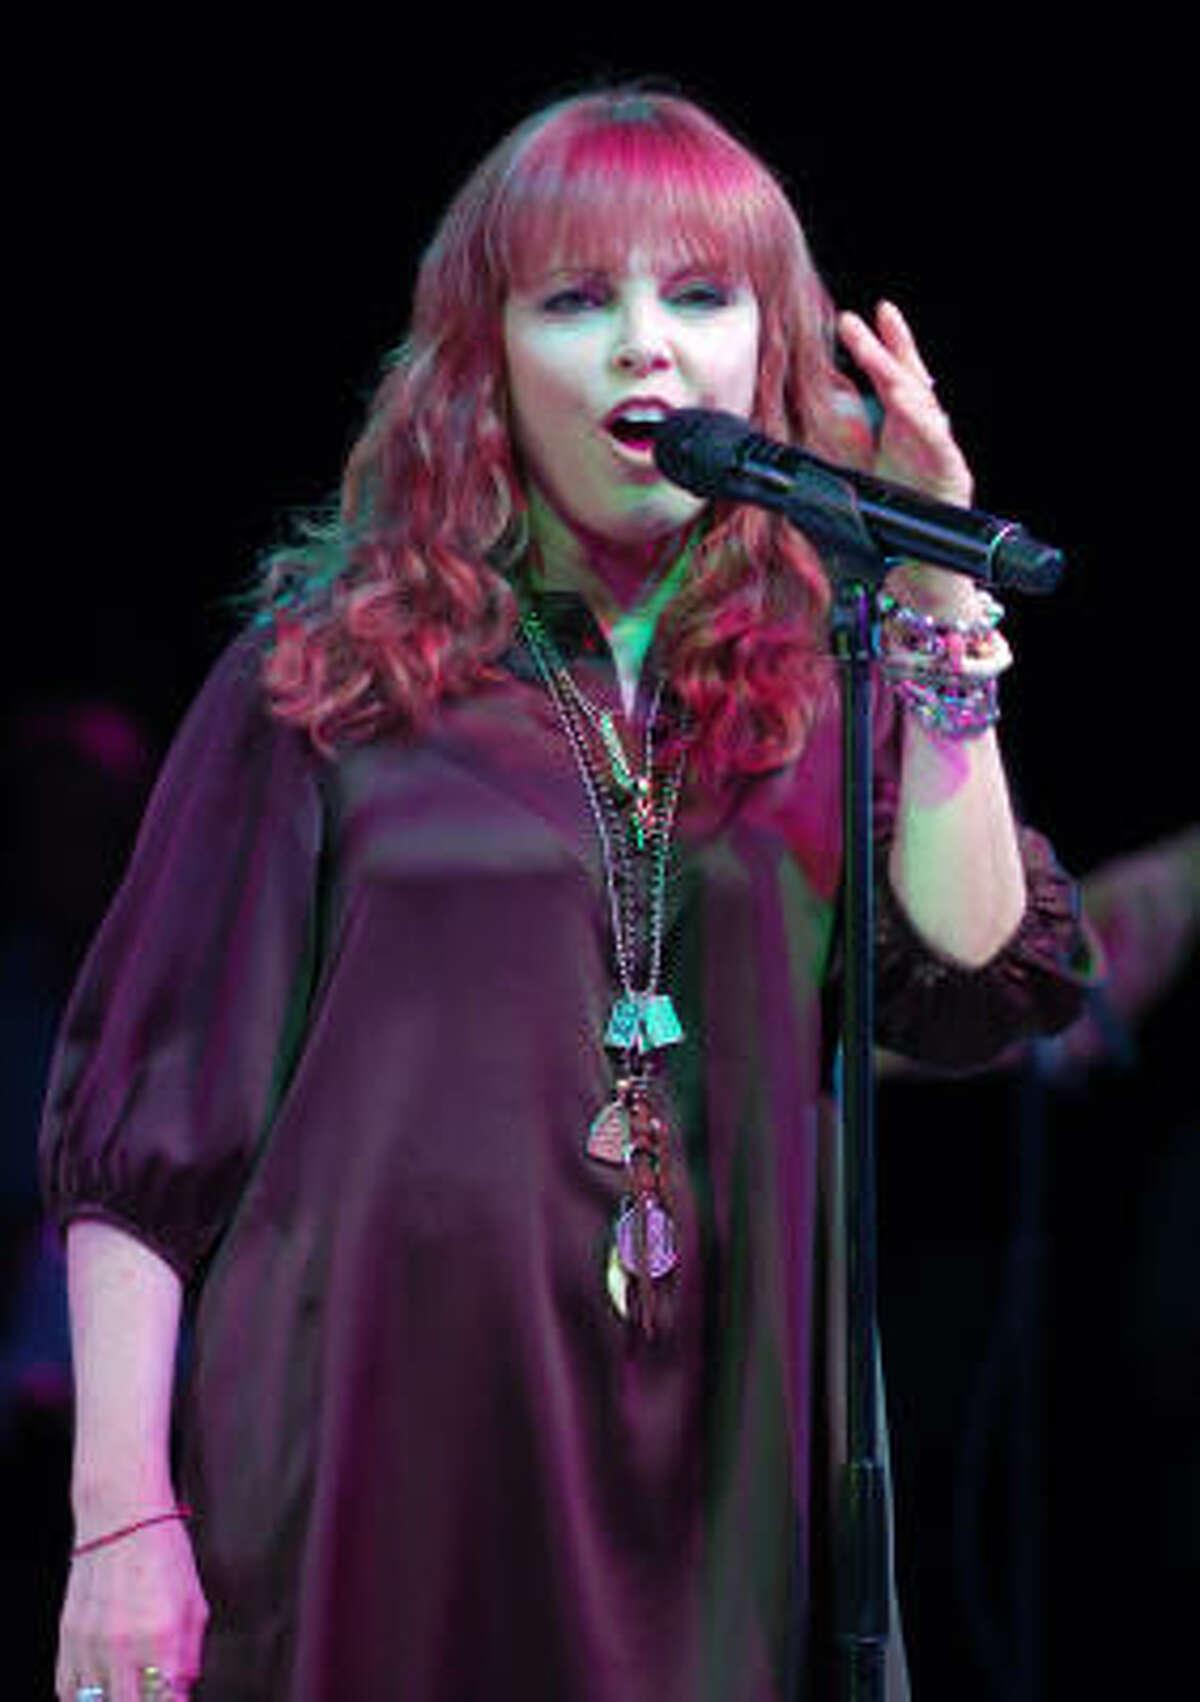 Pat Benatar : She's a four-time Grammy Award winner whose video